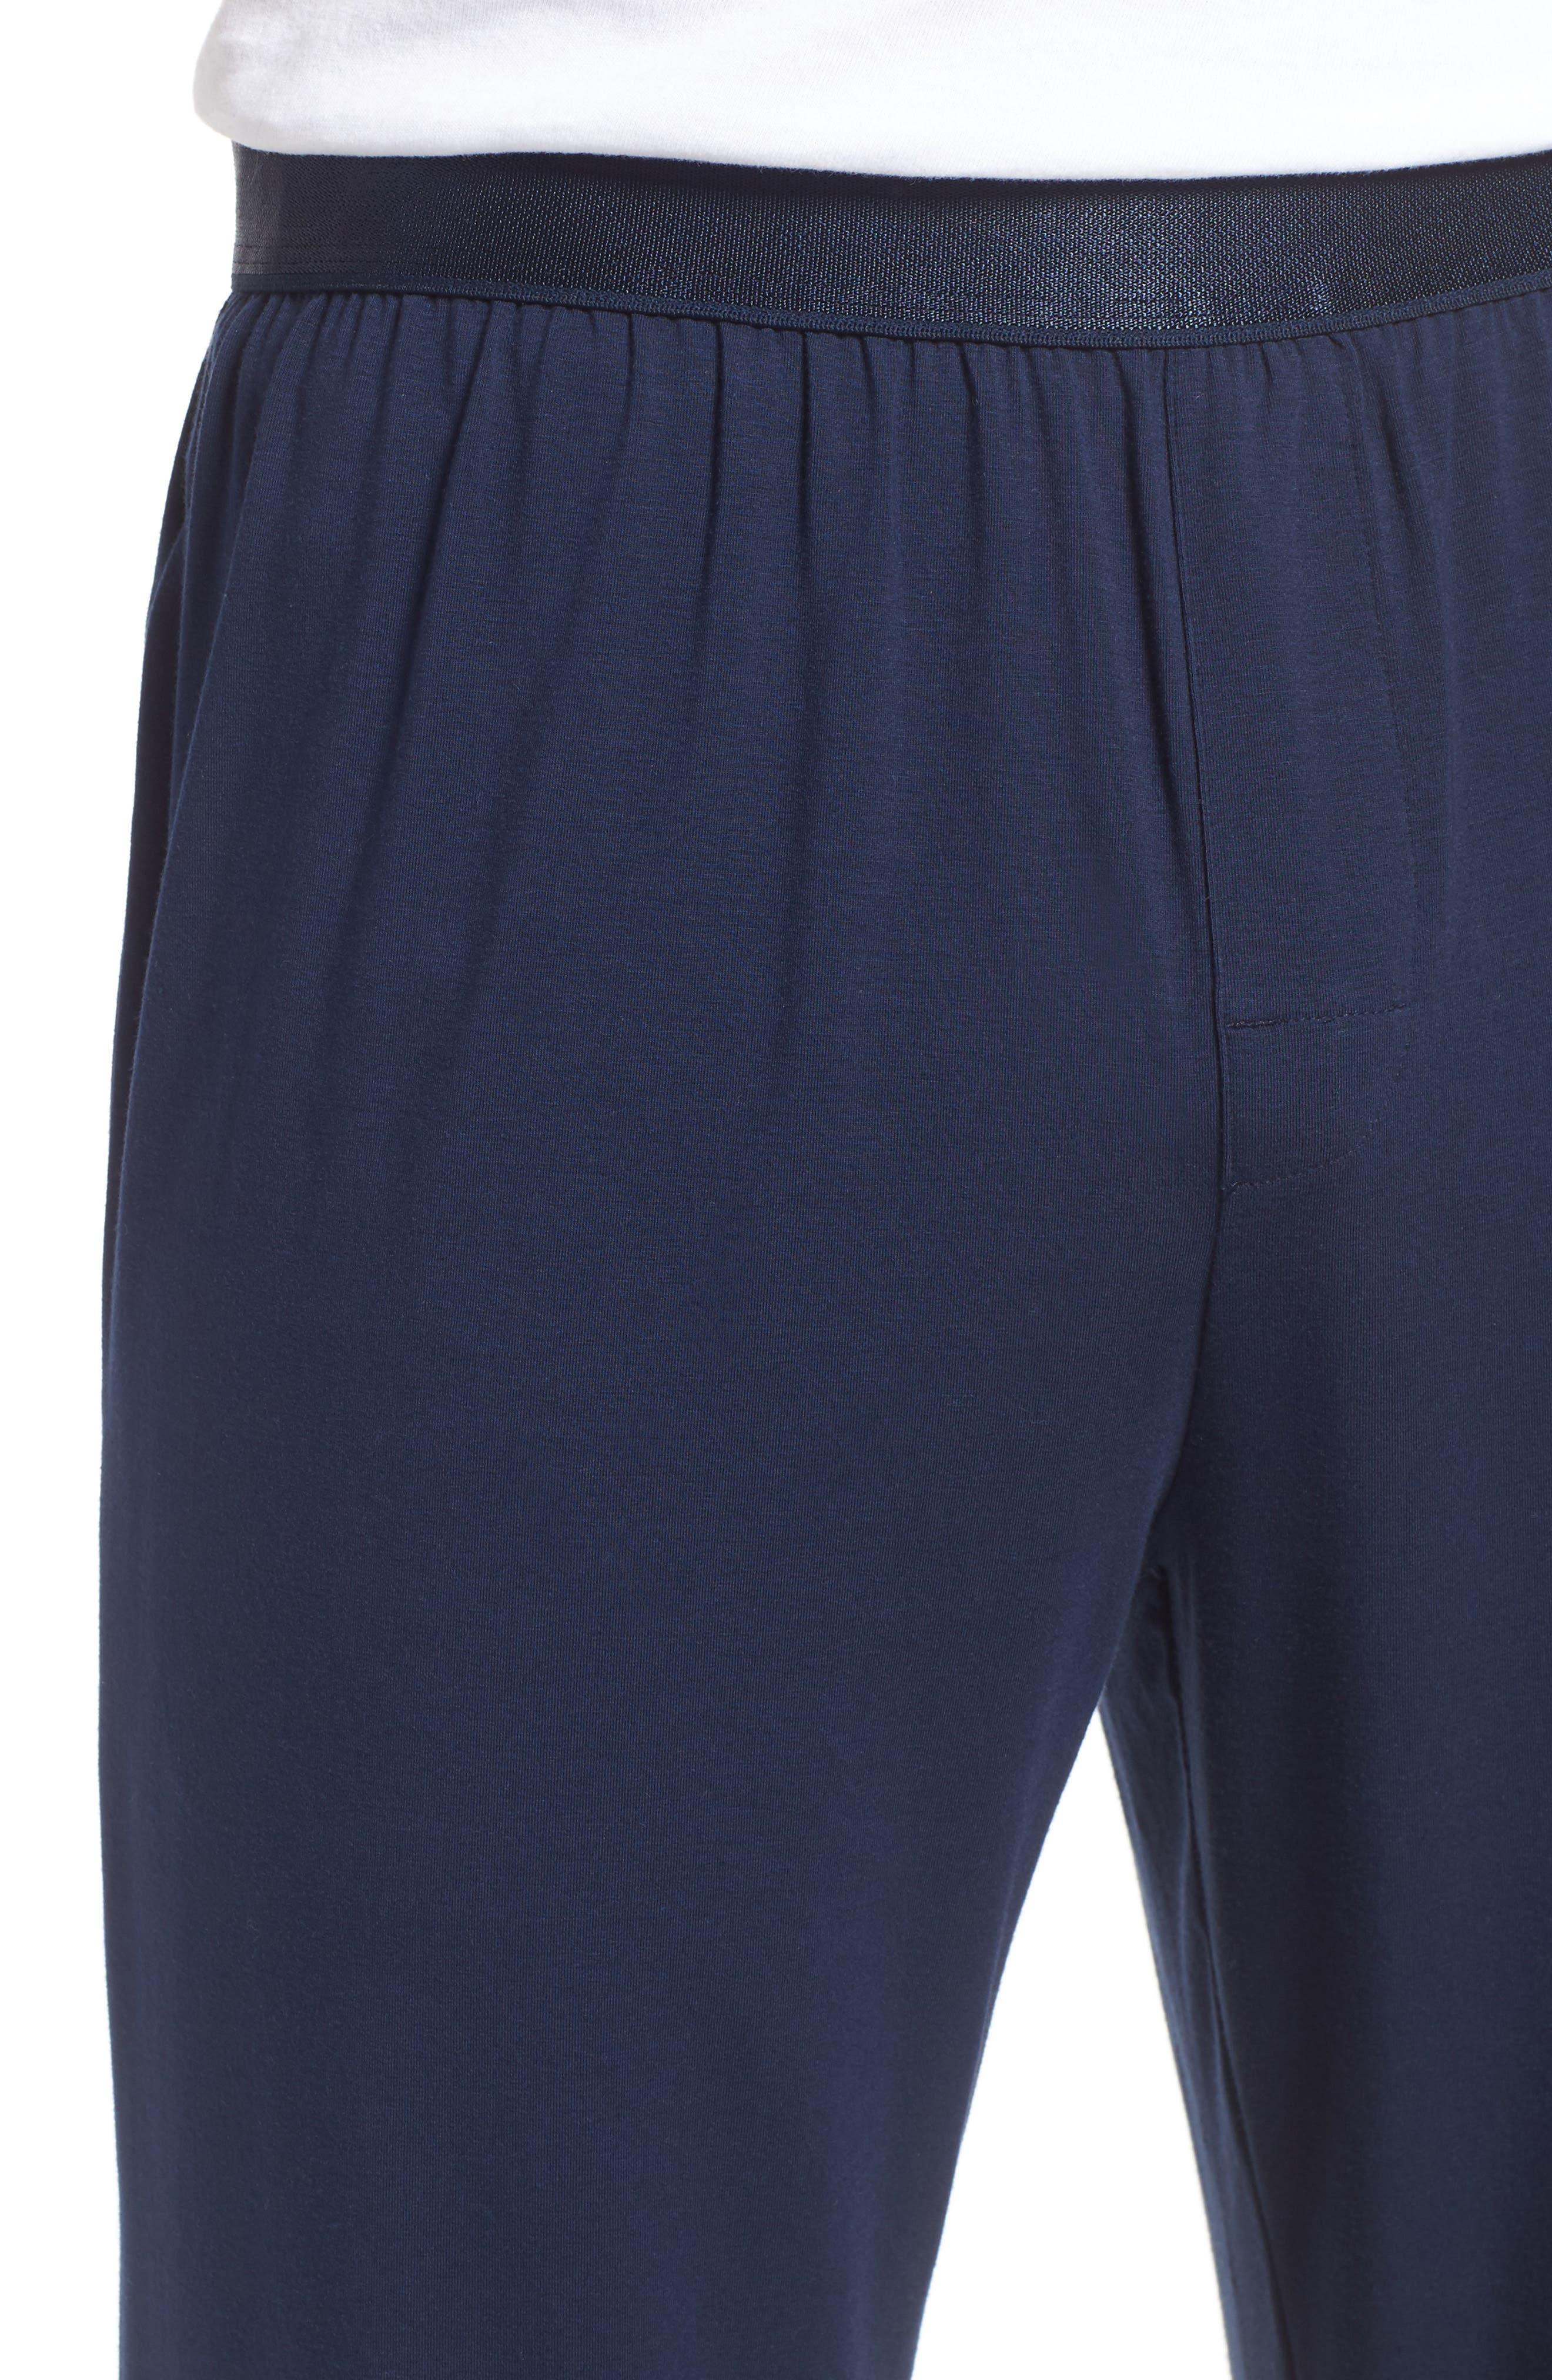 Micromodal Blend Lounge Pants,                             Alternate thumbnail 8, color,